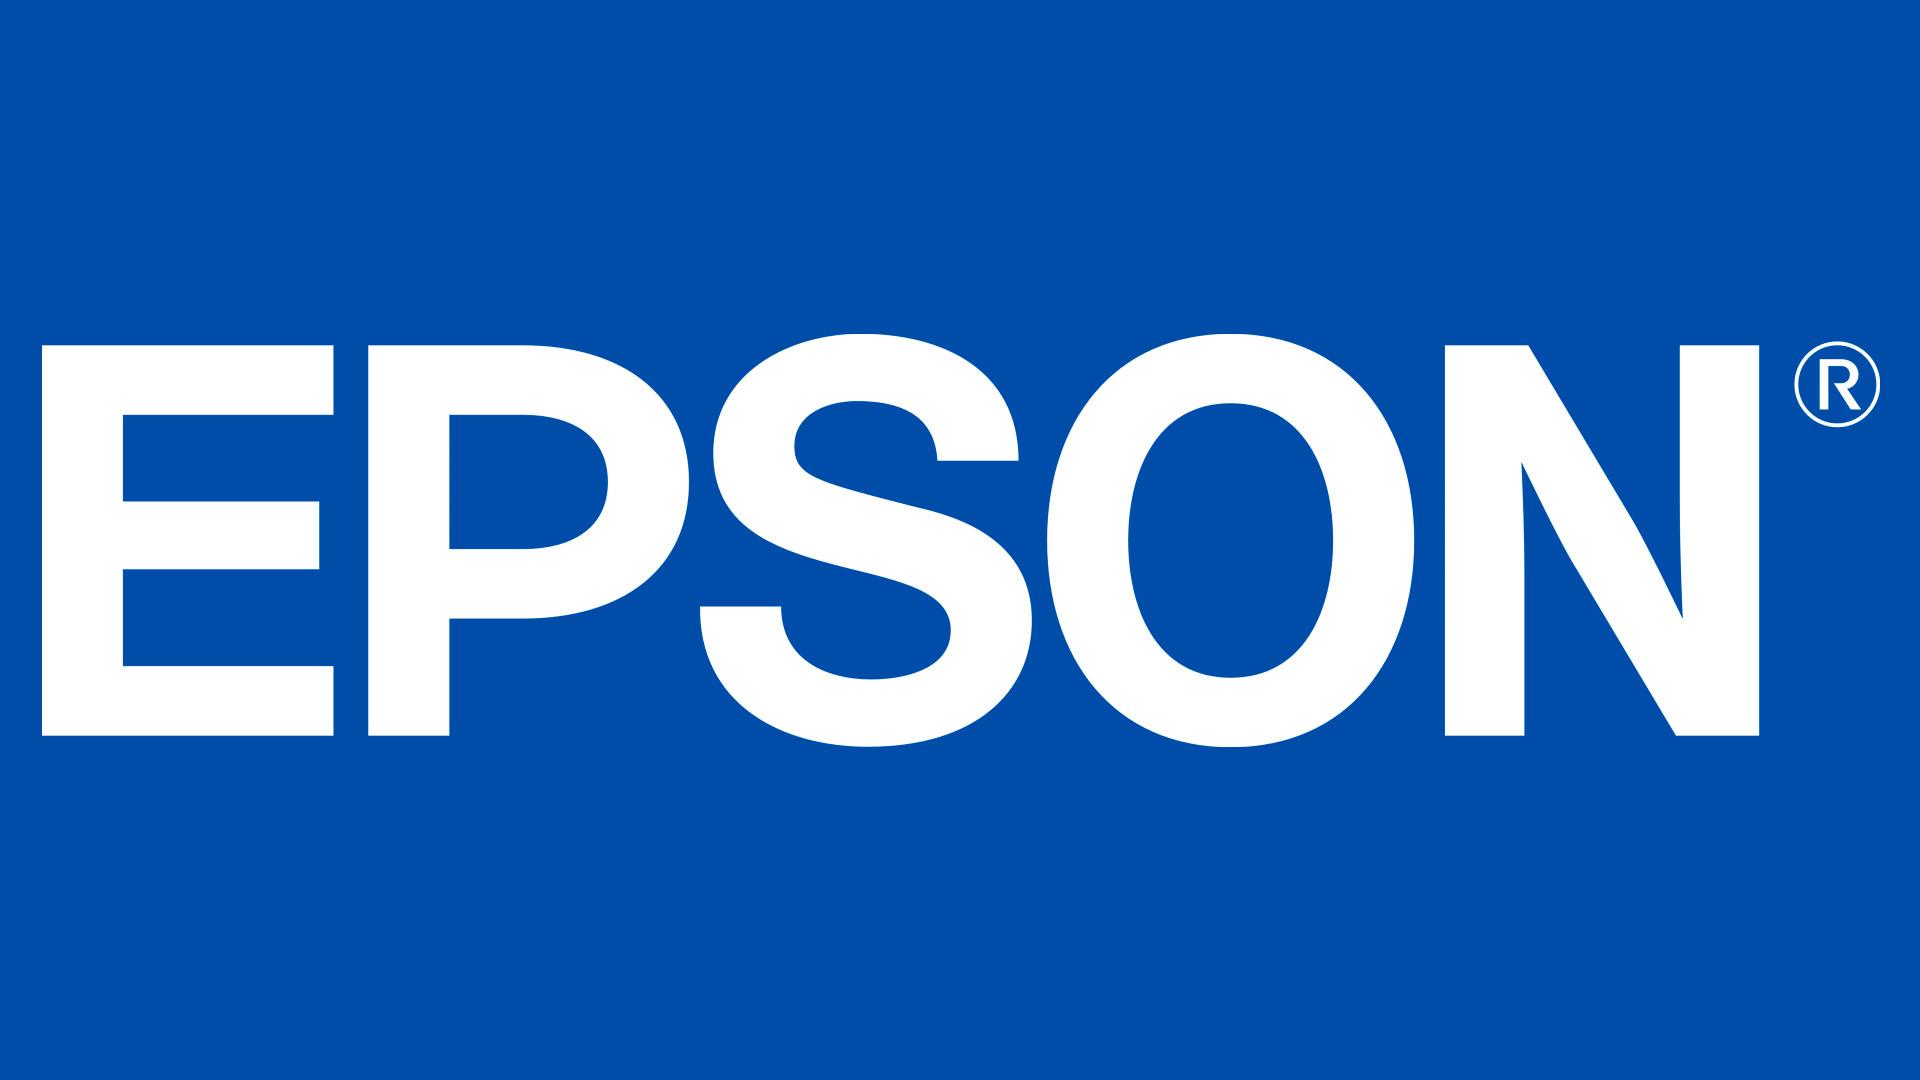 Epson-symbol.jpg